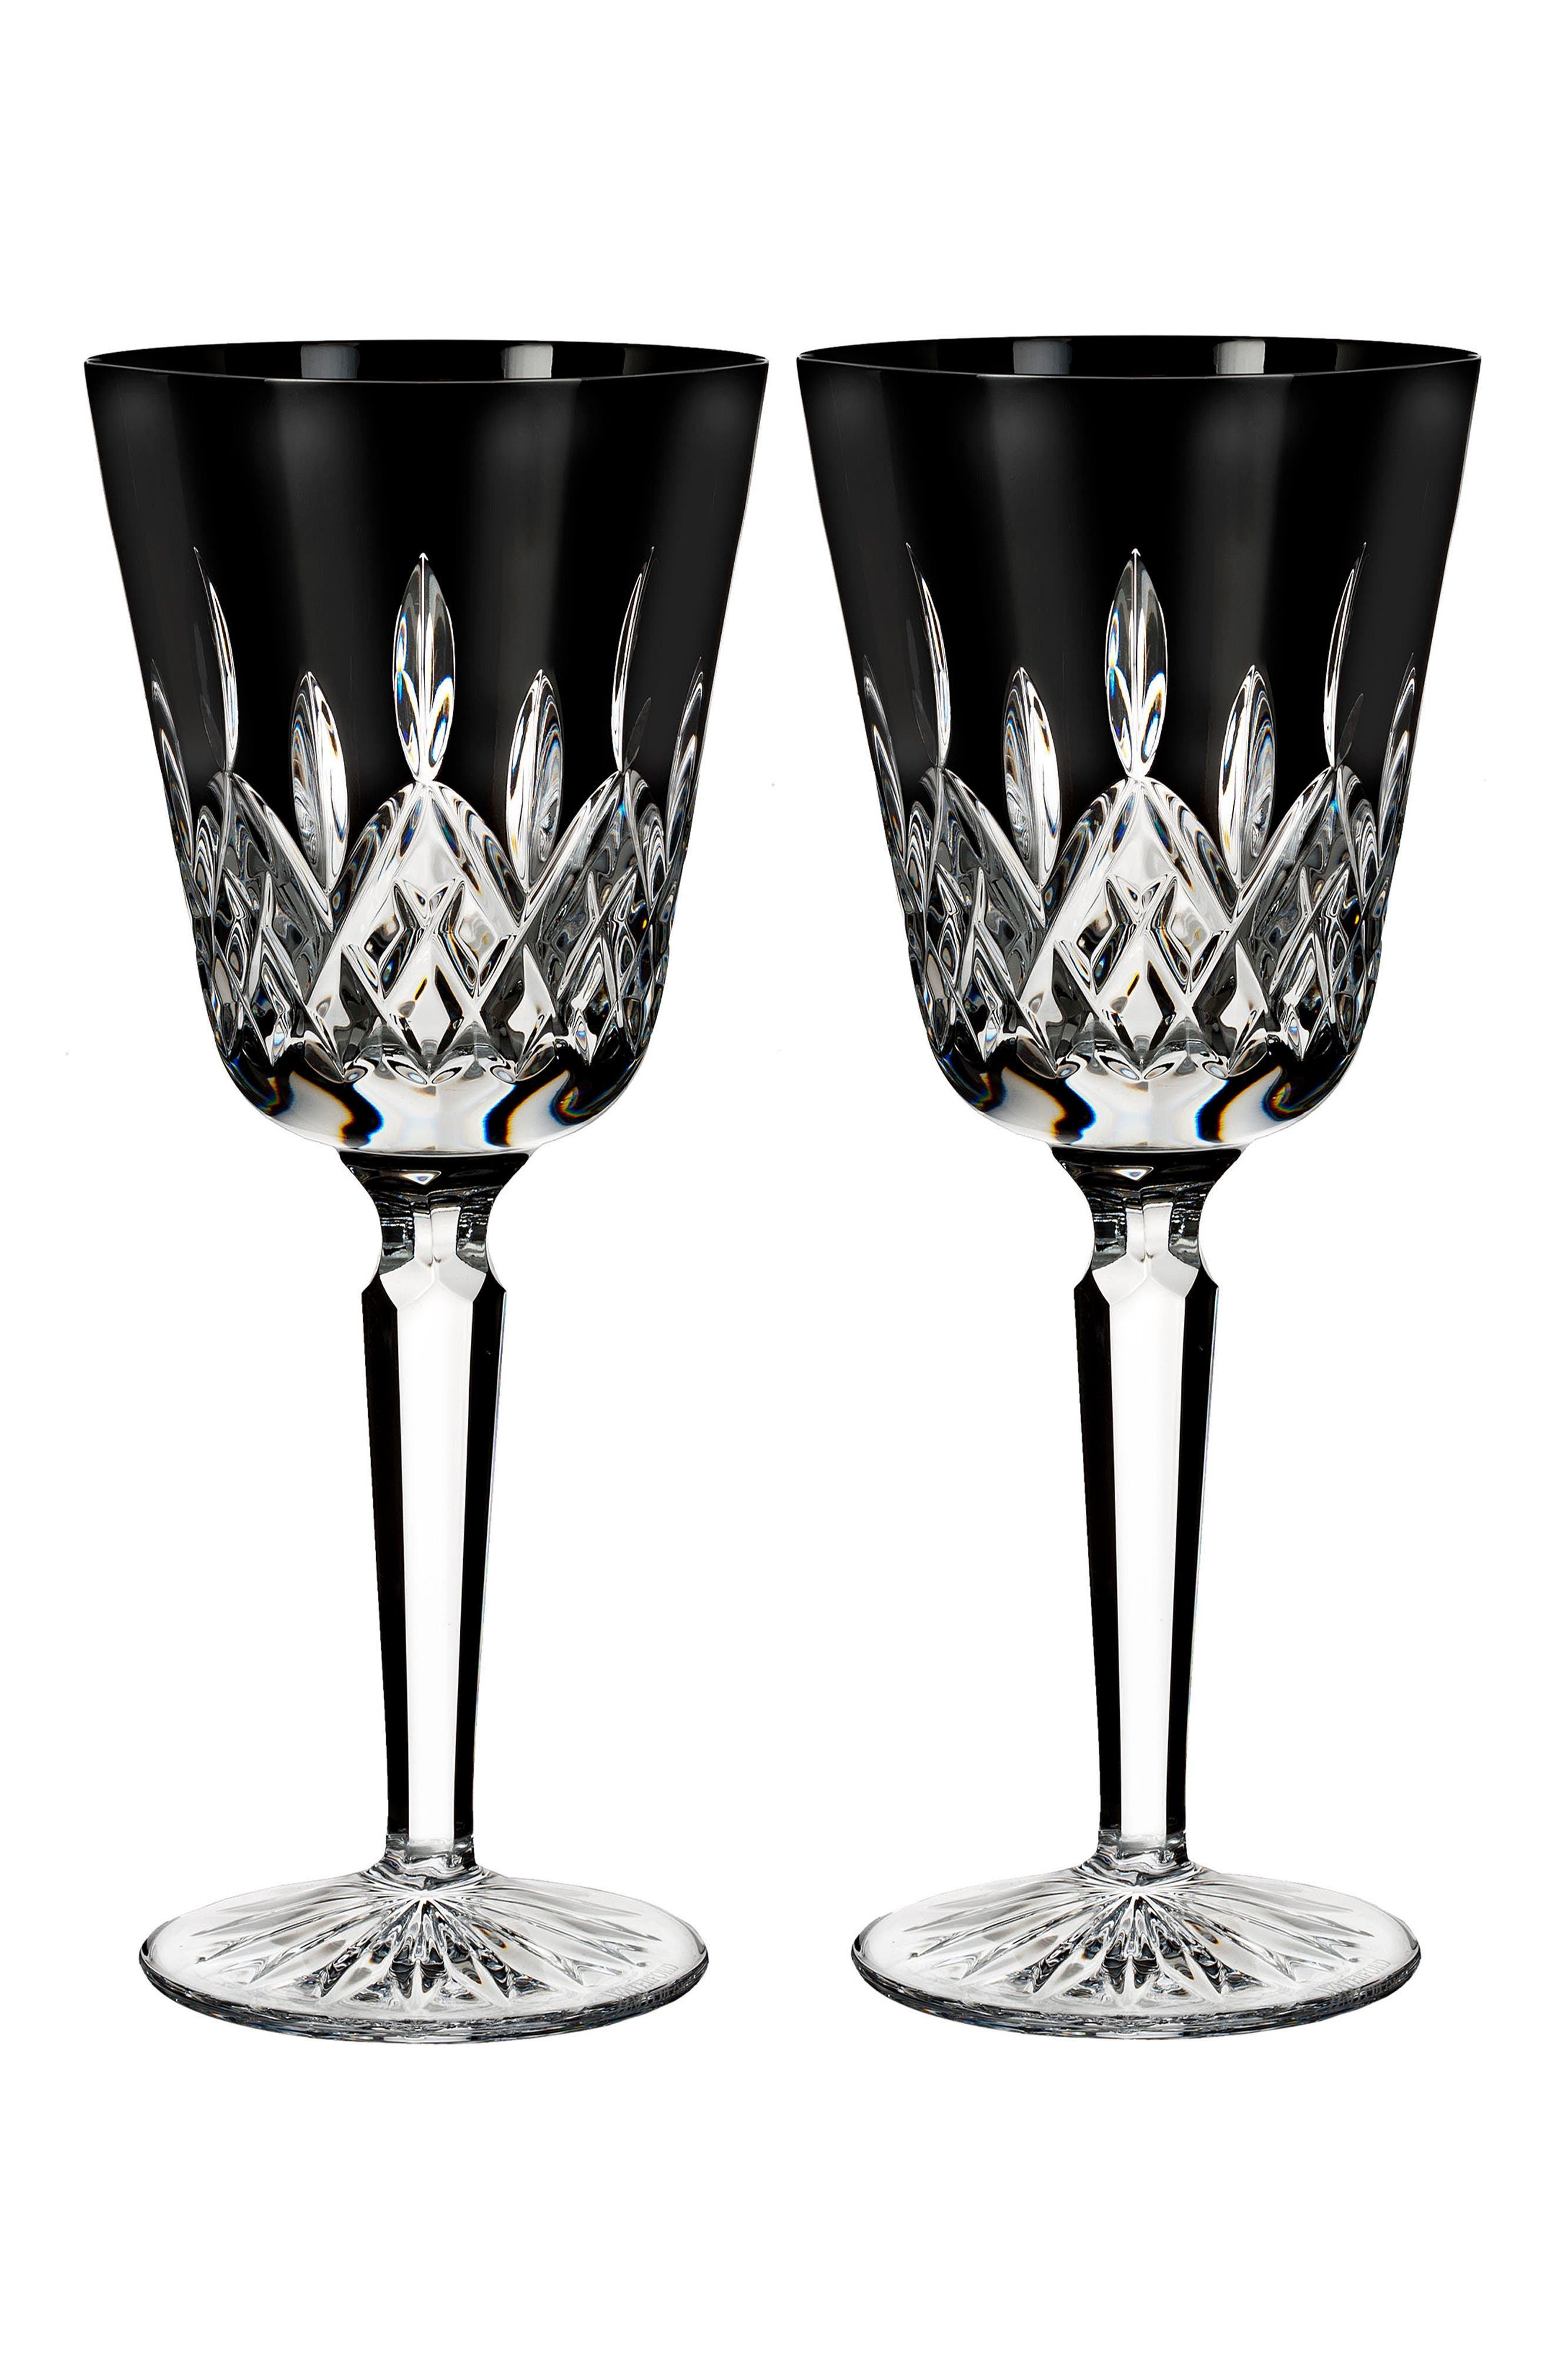 Main Image - Waterford Lismore Diamond Set of 2 Black Lead Crystal Goblets